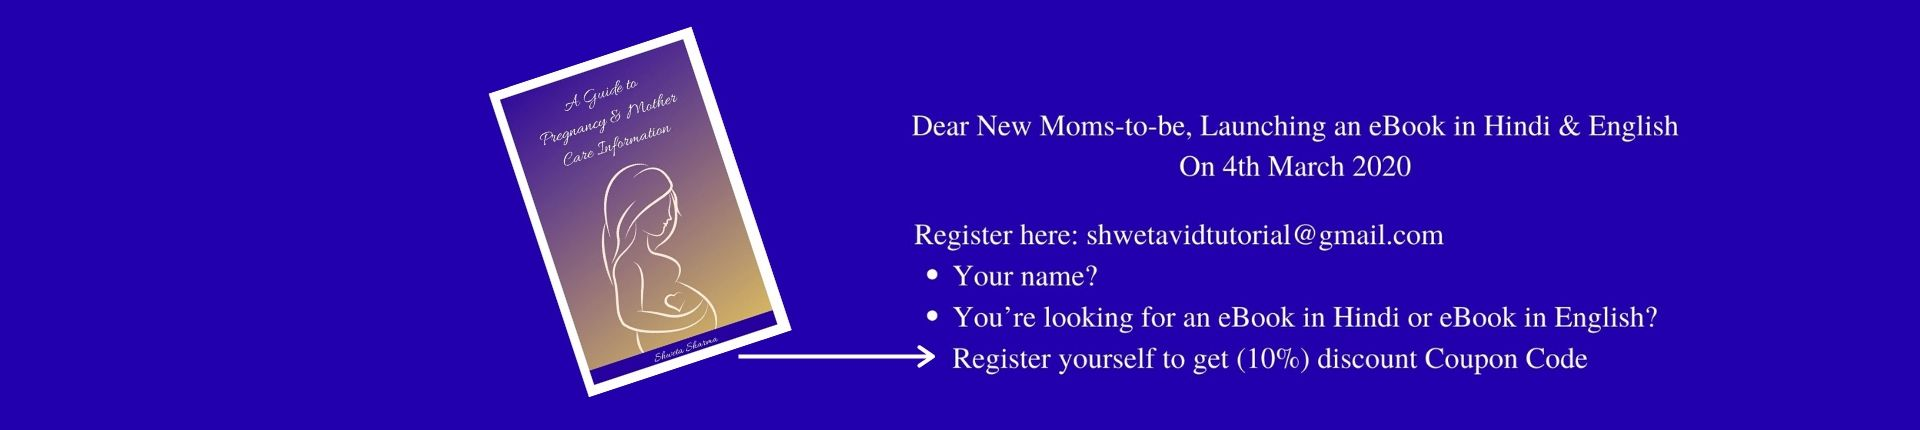 Pregnancy & Mother Care Information